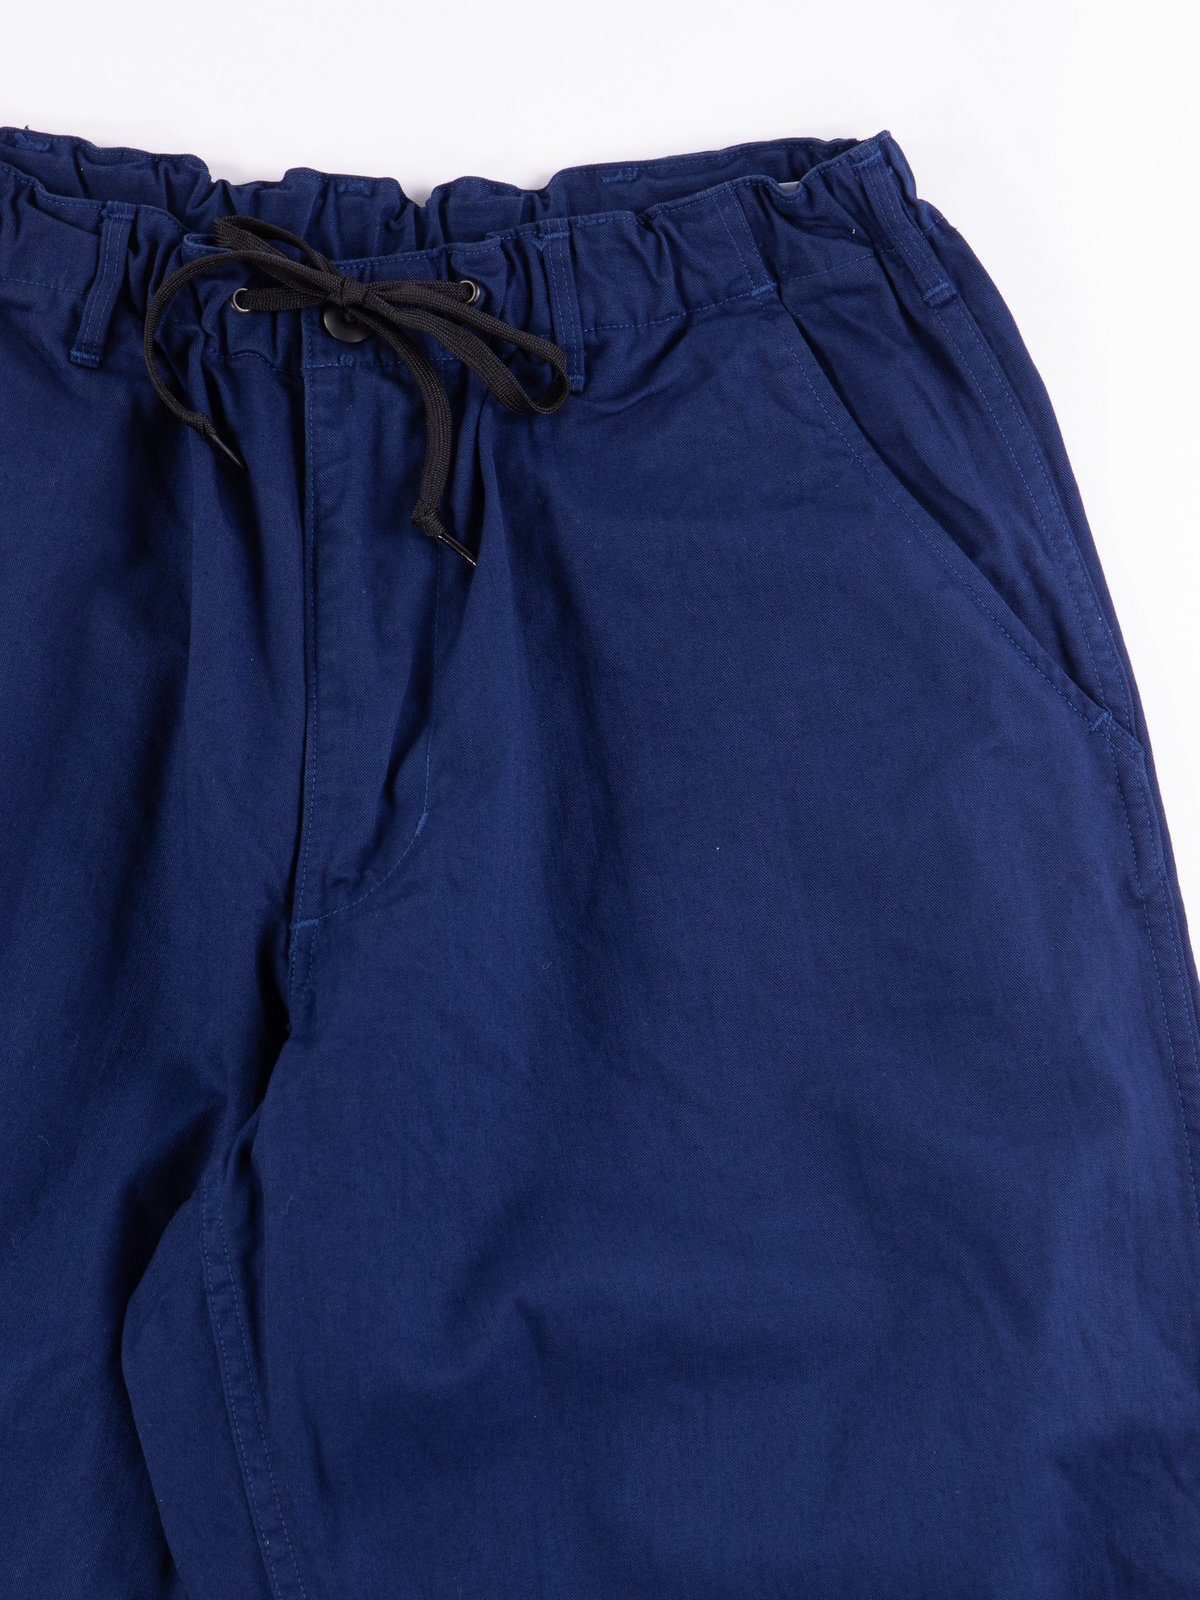 Ink Blue Herringbone TBB Service Pant - Image 4